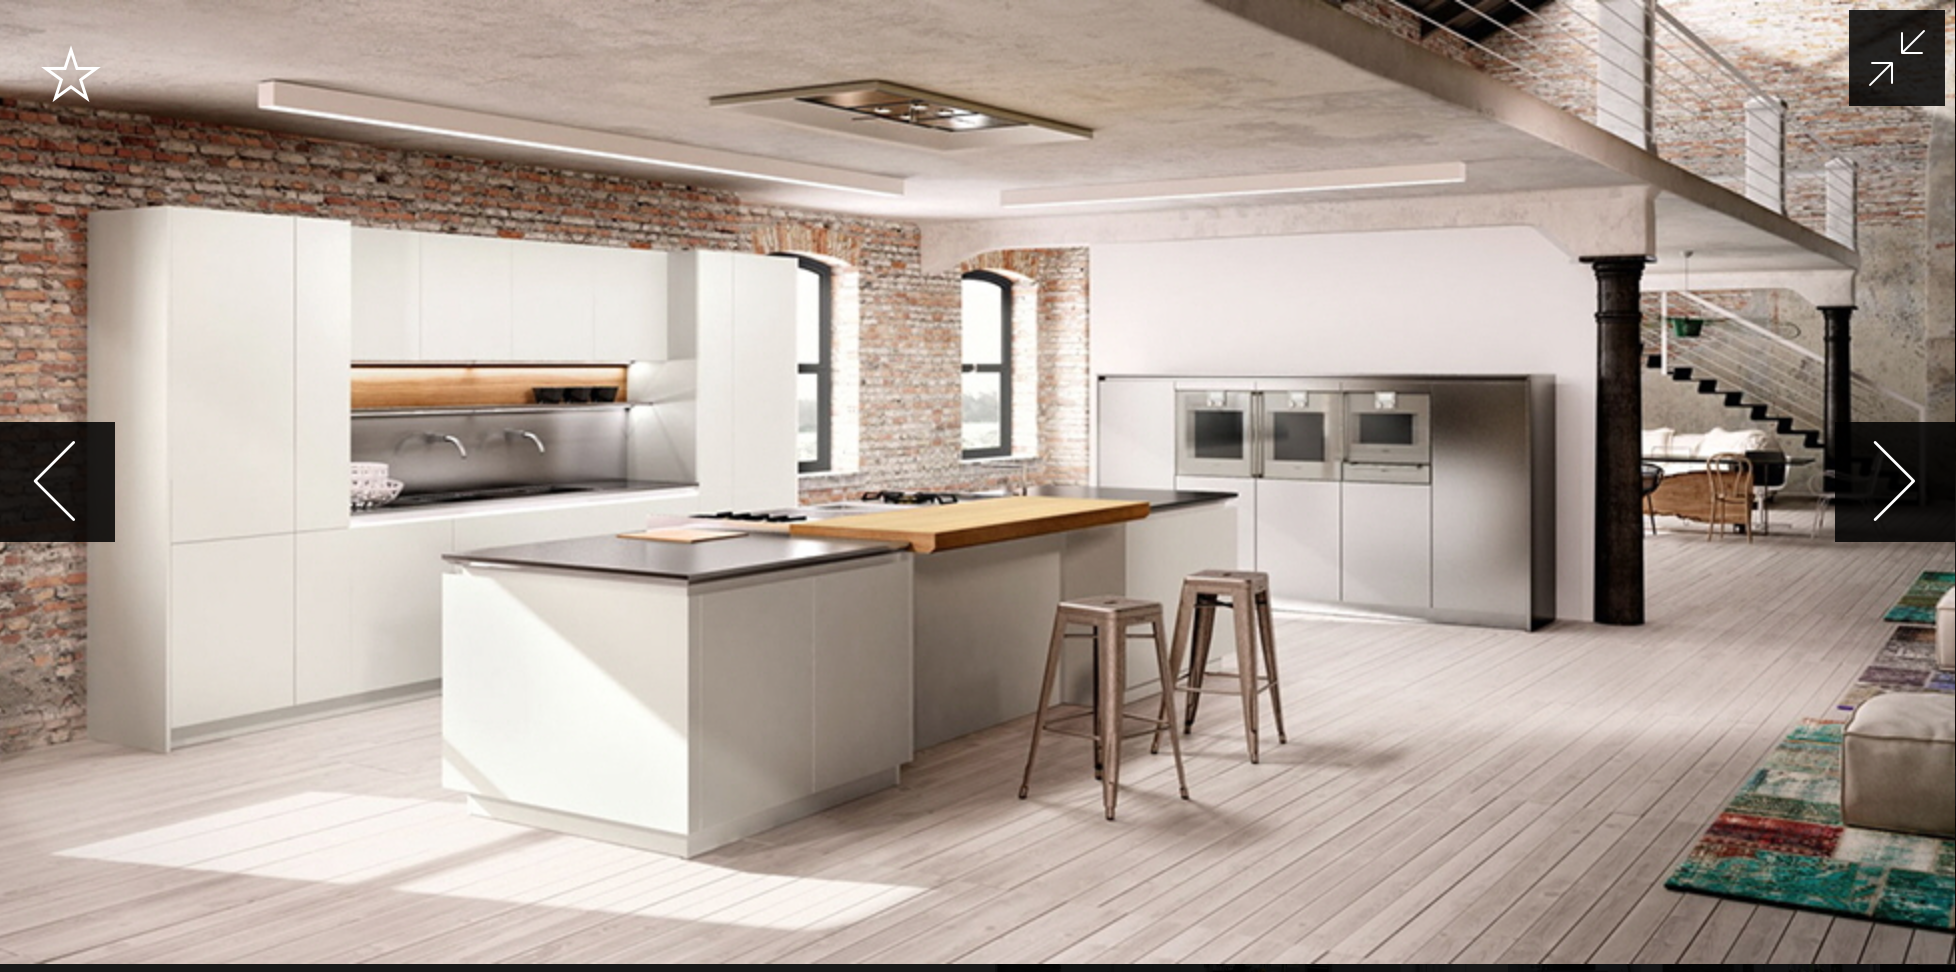 13 Best Linea Quattro Italian Kitchens Style Images On Pinterest  # Muebles New Style Villa Tesei